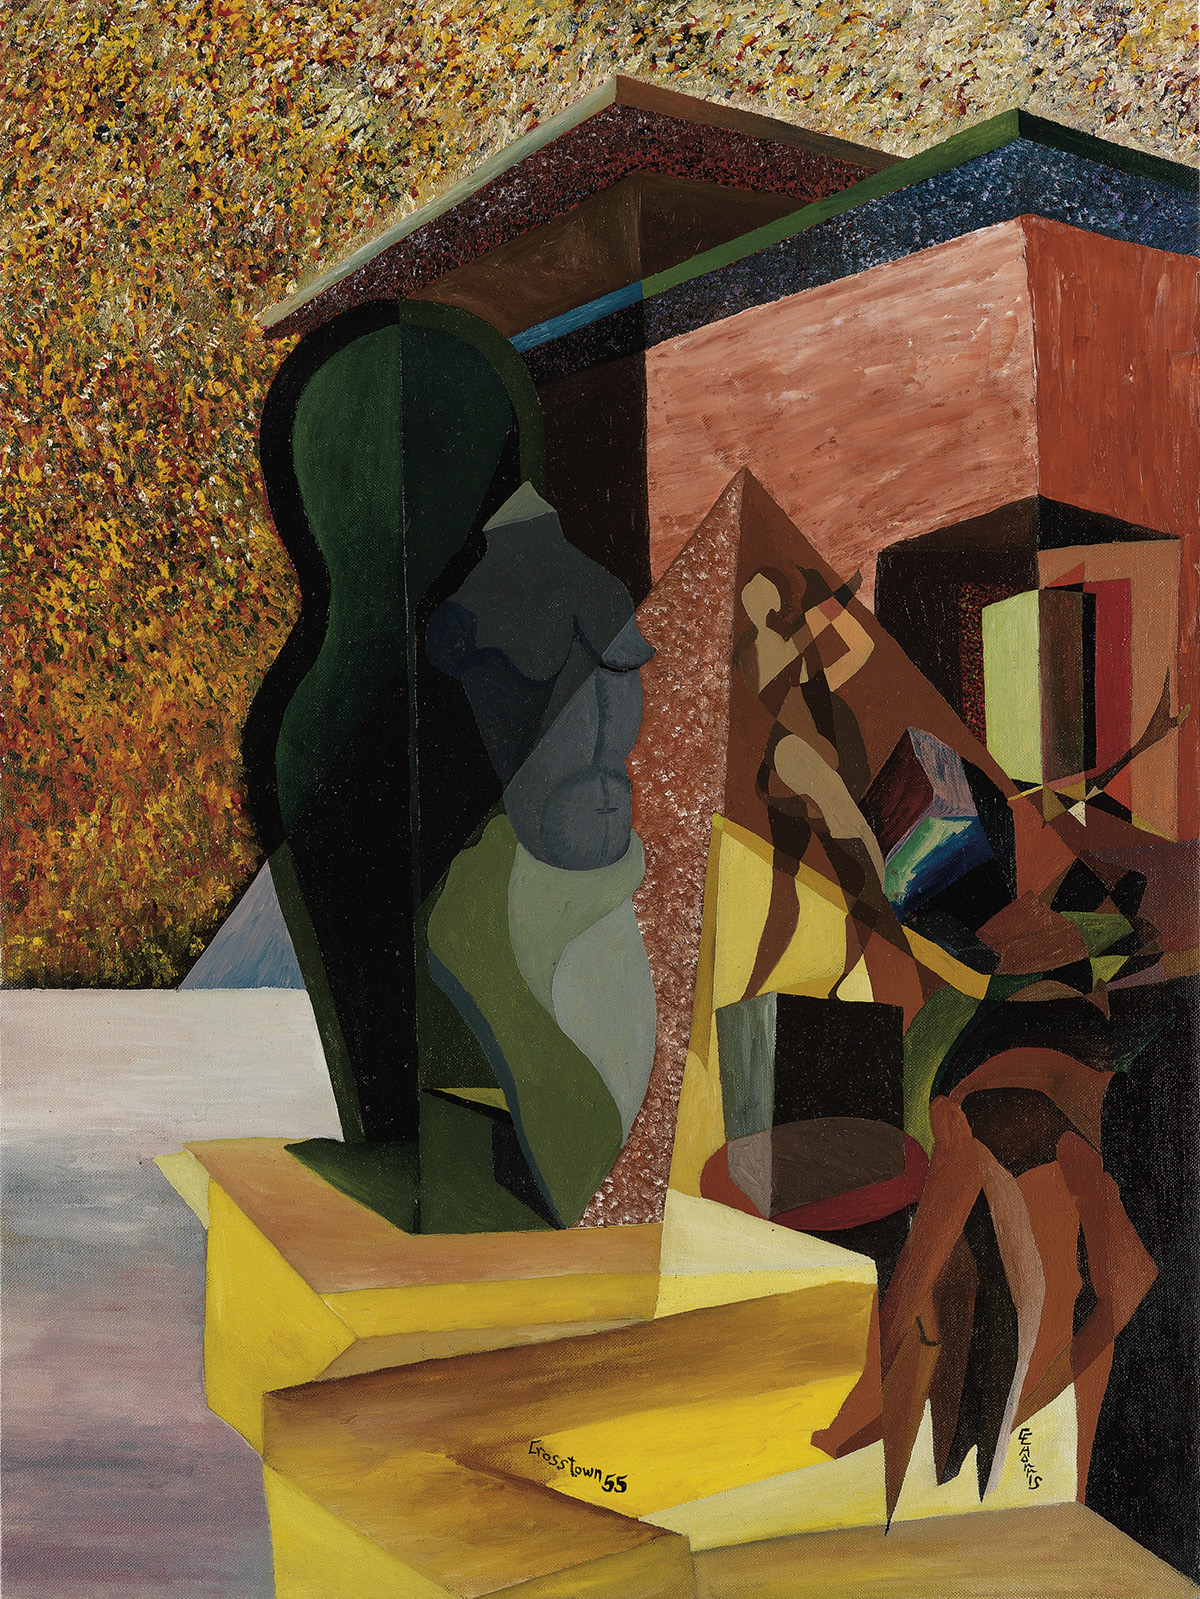 CHARLES ELMER HARRIS (BENI E. KOSH) (1917 - 1993) Two surreal paintings.